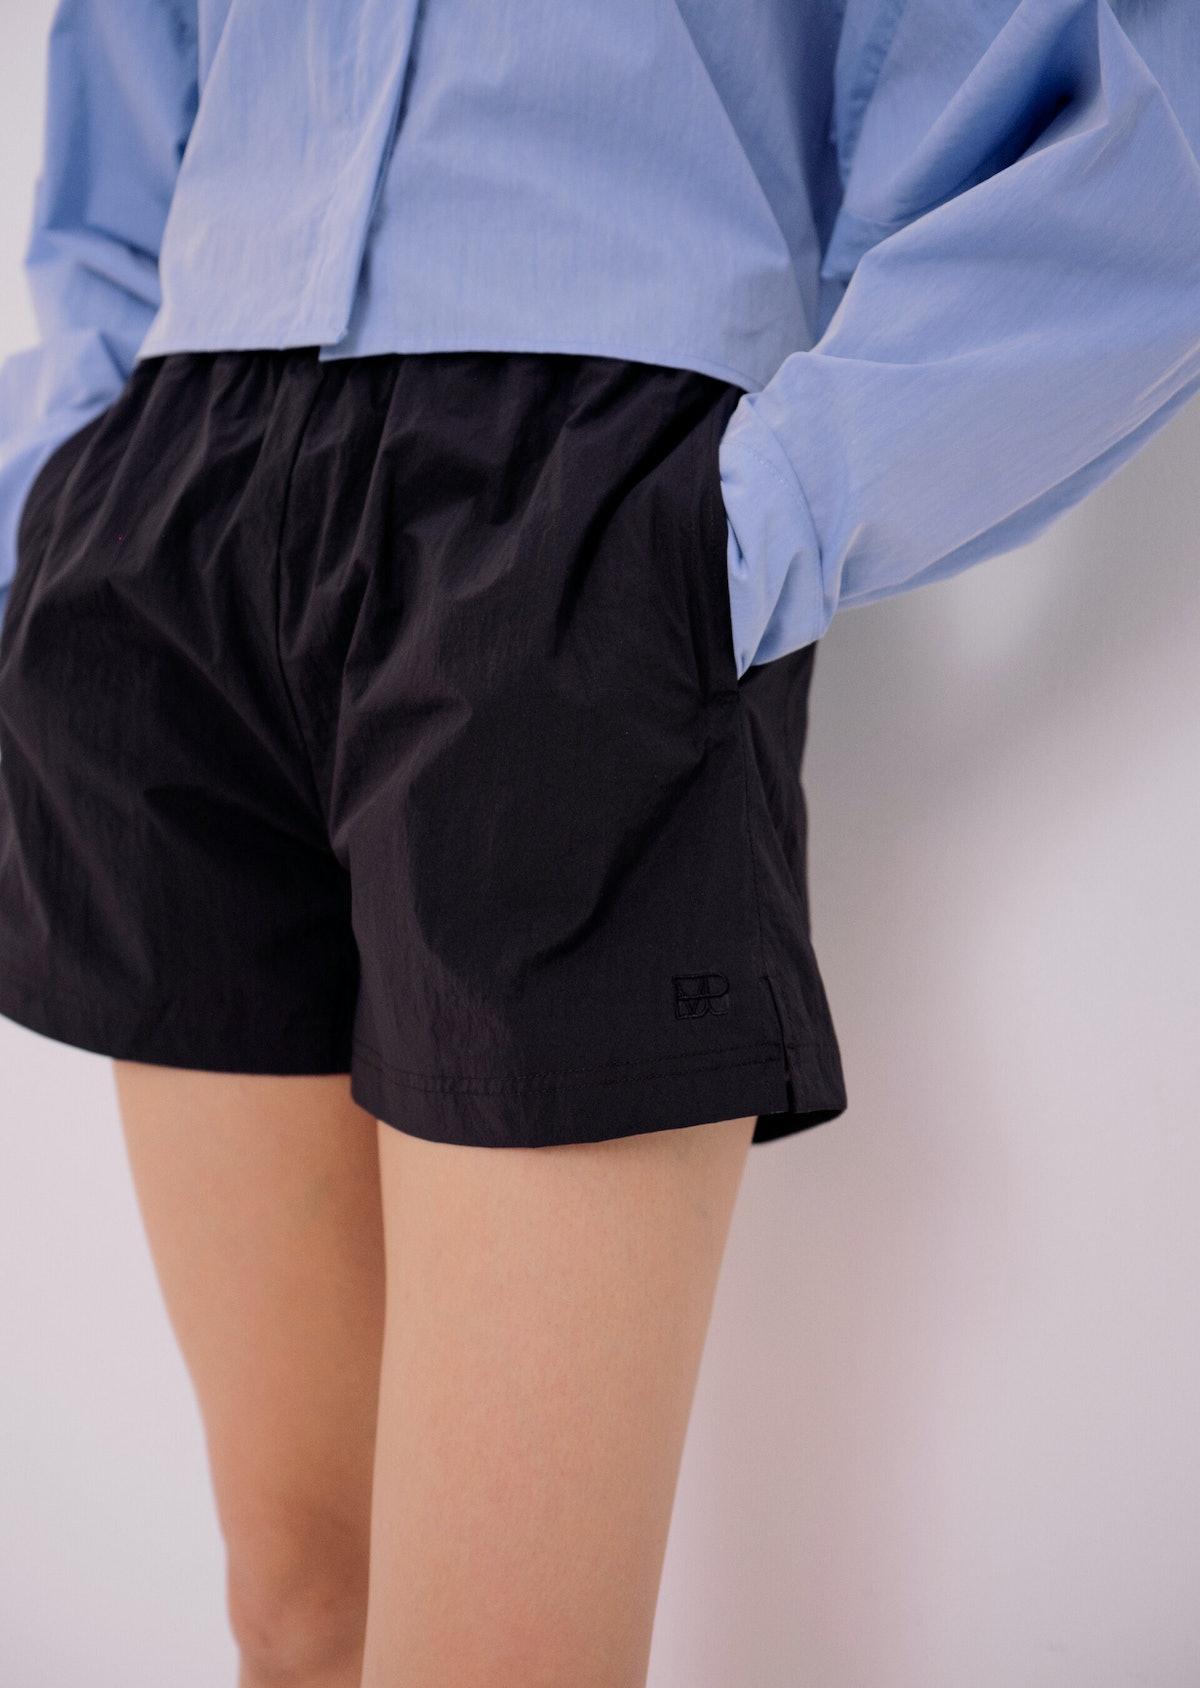 Nylon Shorts in Black